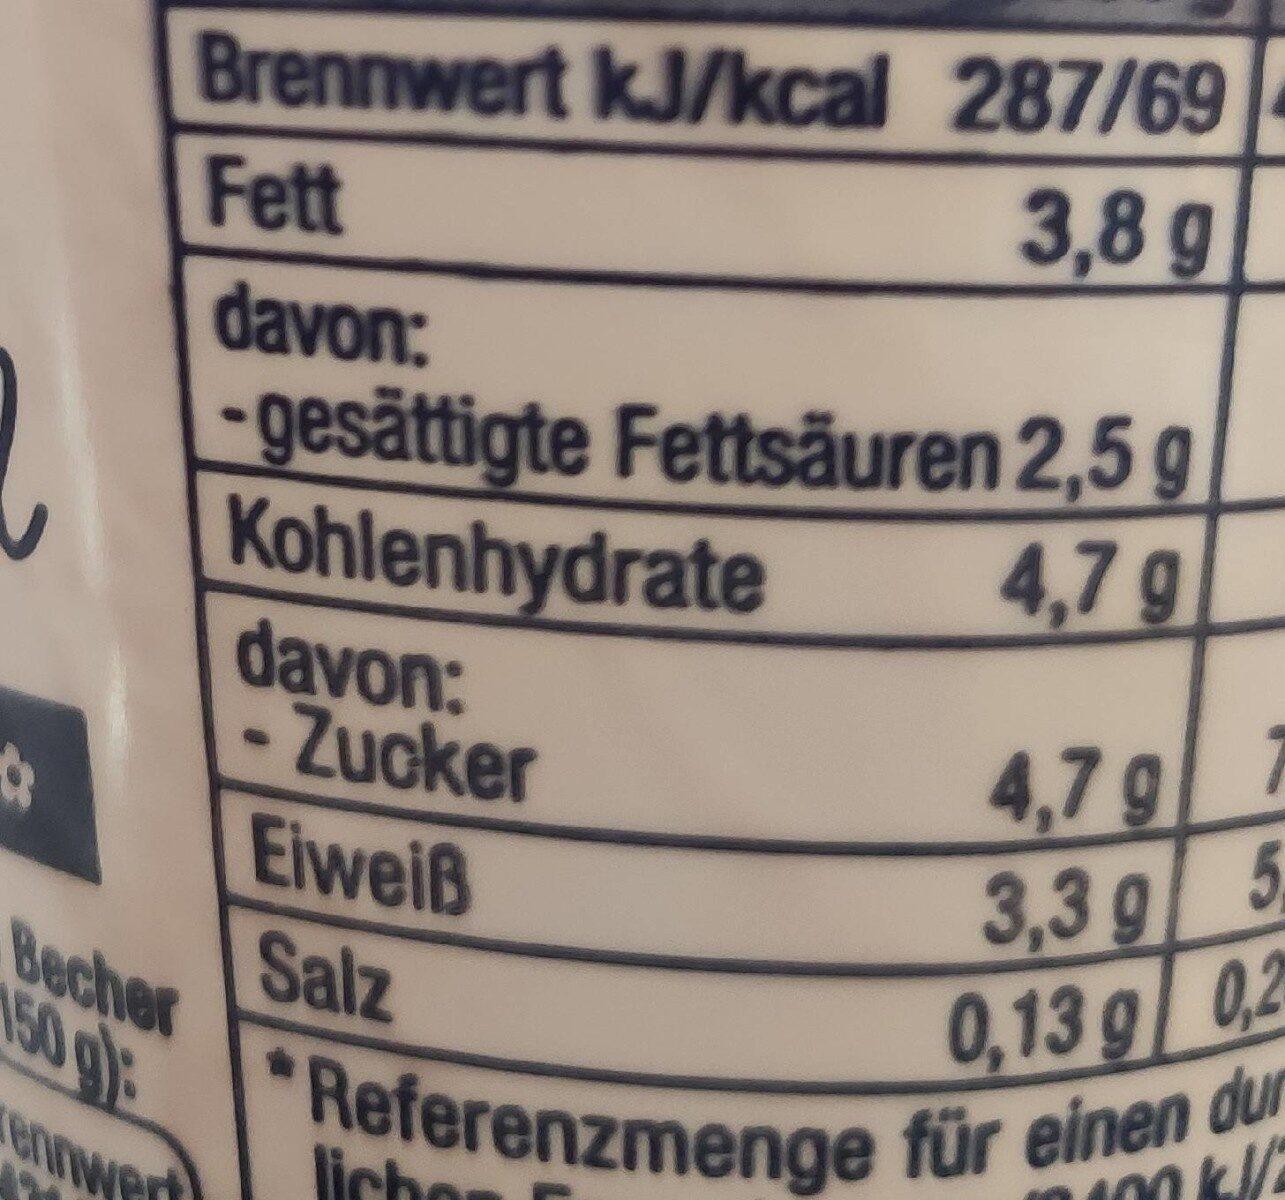 Joghurt mild - stichfest - Nährwertangaben - de